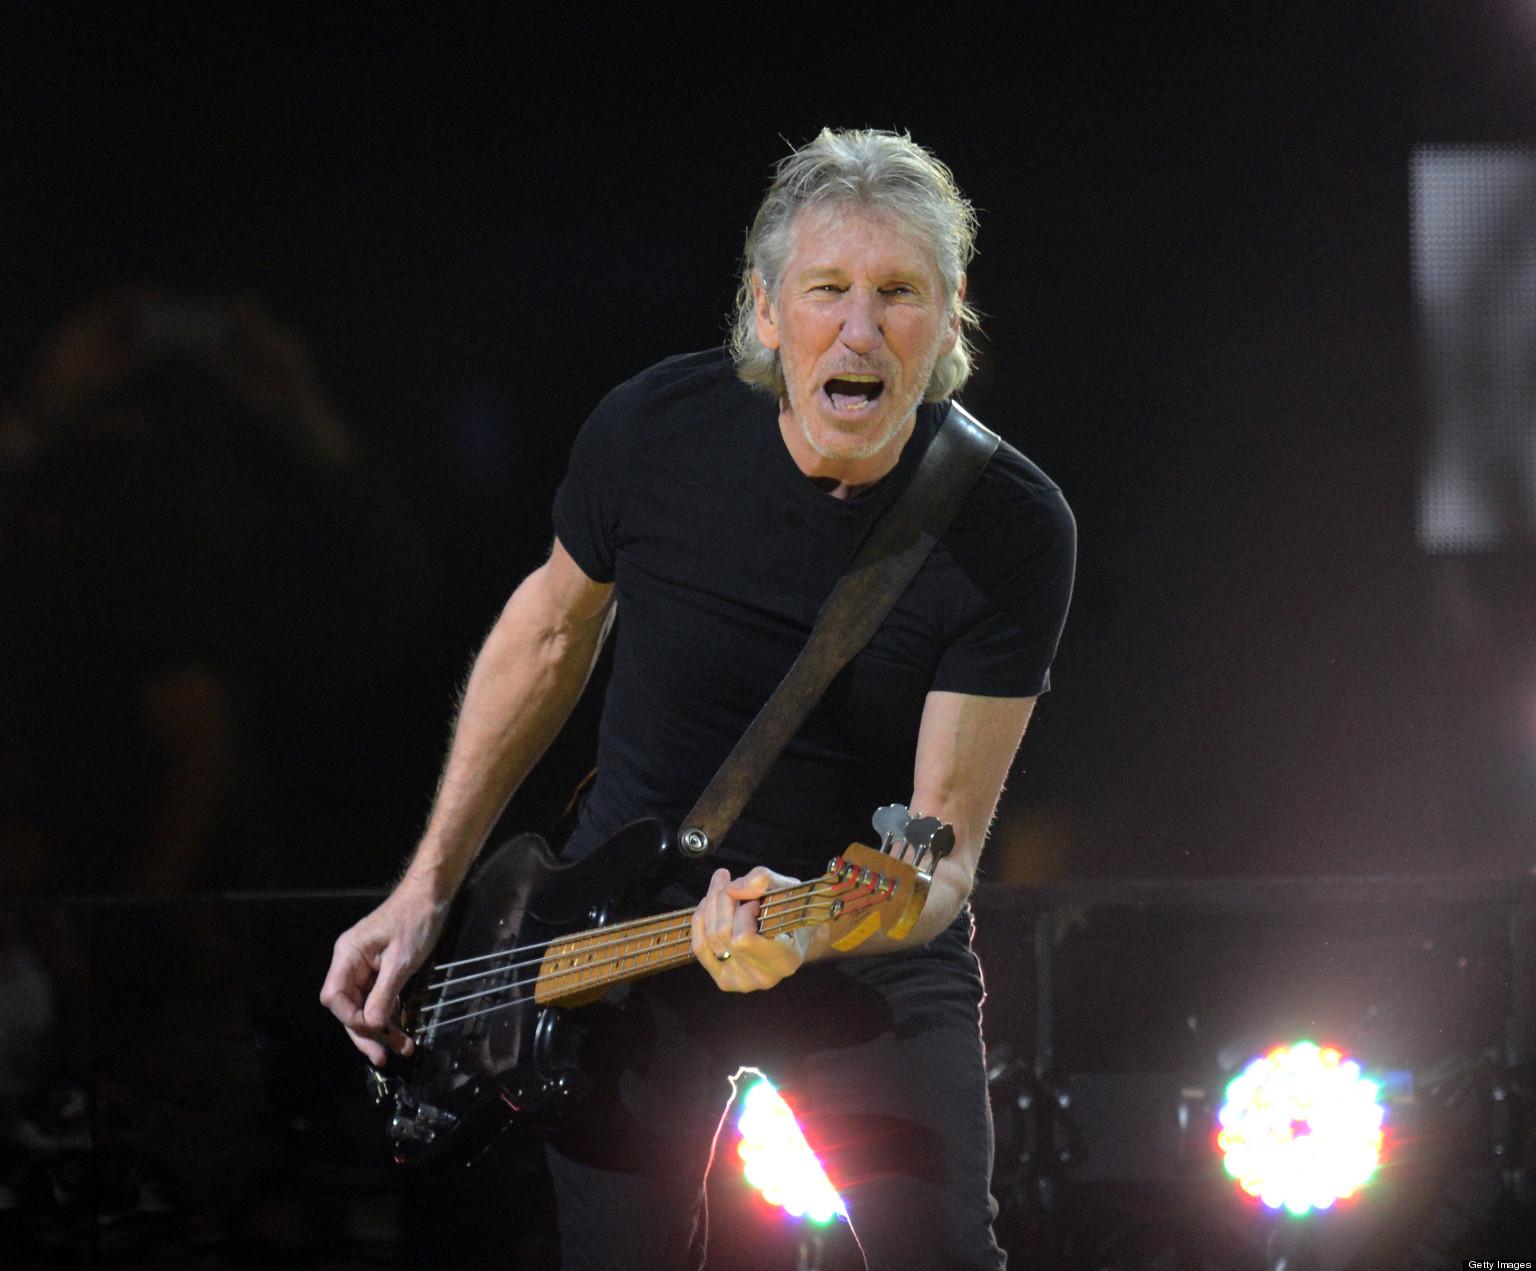 Rock Legend Reconsidering Israel Boycott